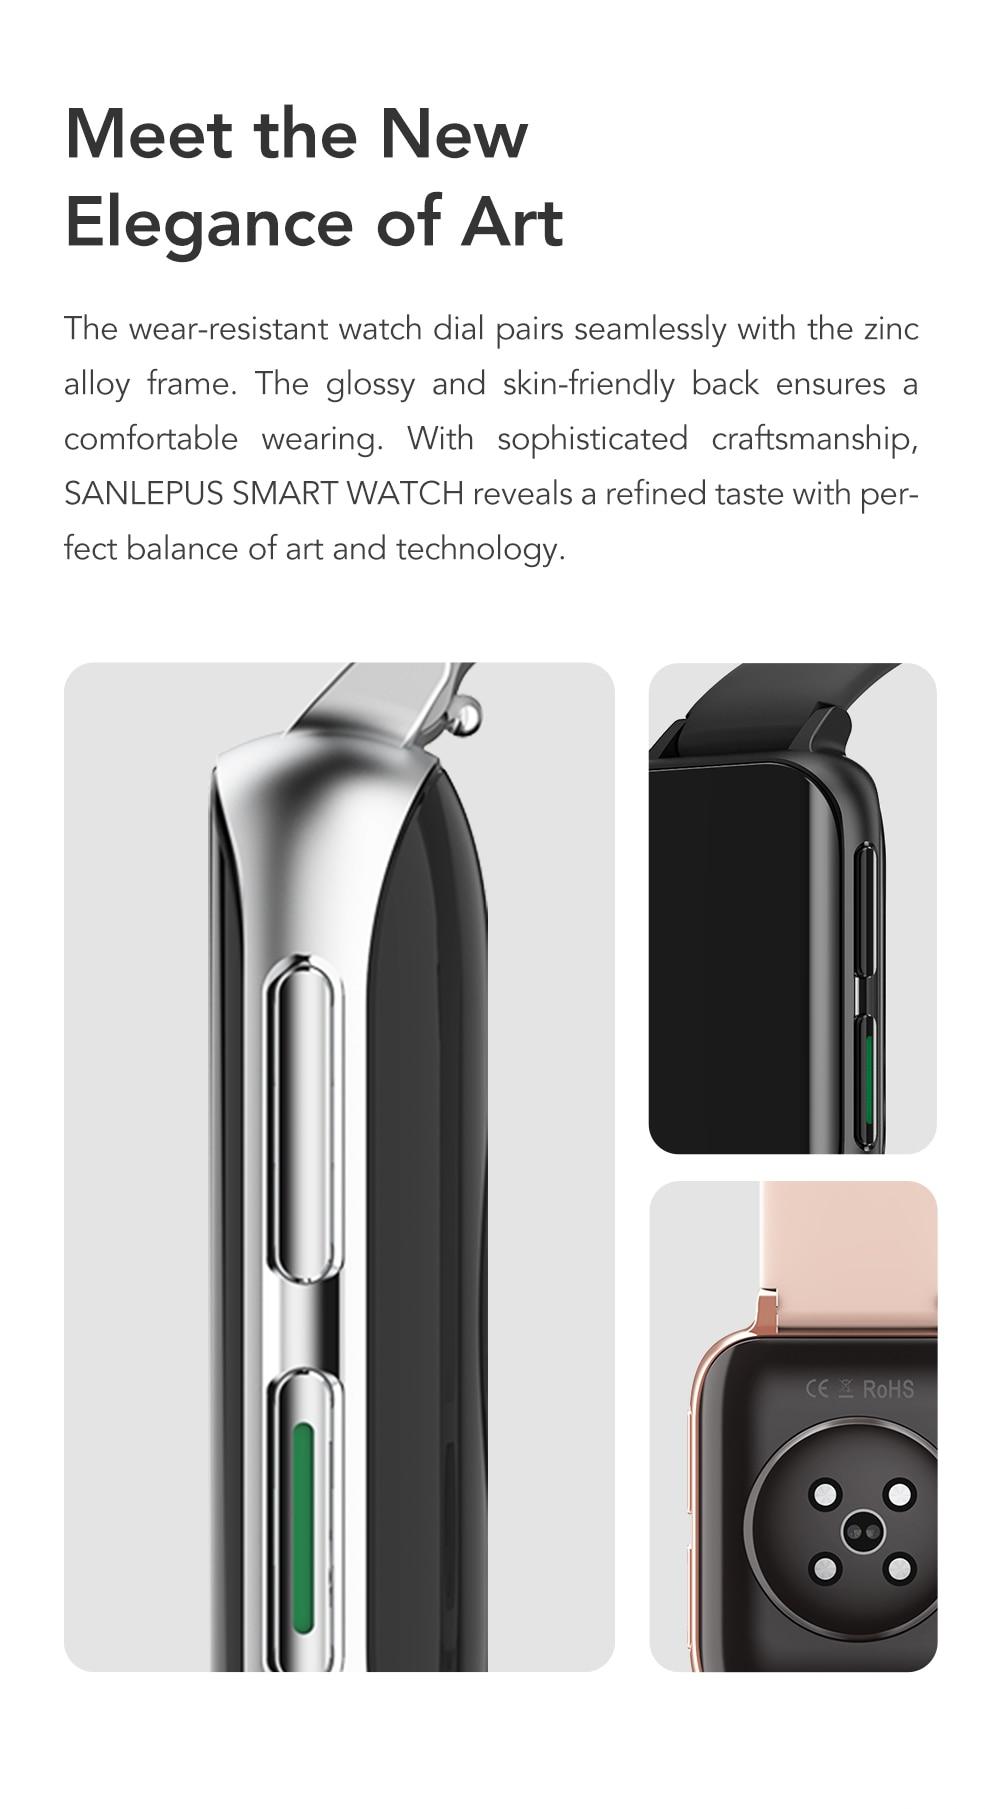 H46f7da523b3446189389cfc3280b158bT SANLEPUS 2021 New Smart Watch Men Women Dial Call Watch Waterproof Smartwatch MP3 Player For OPPO Android Apple Xiaomi